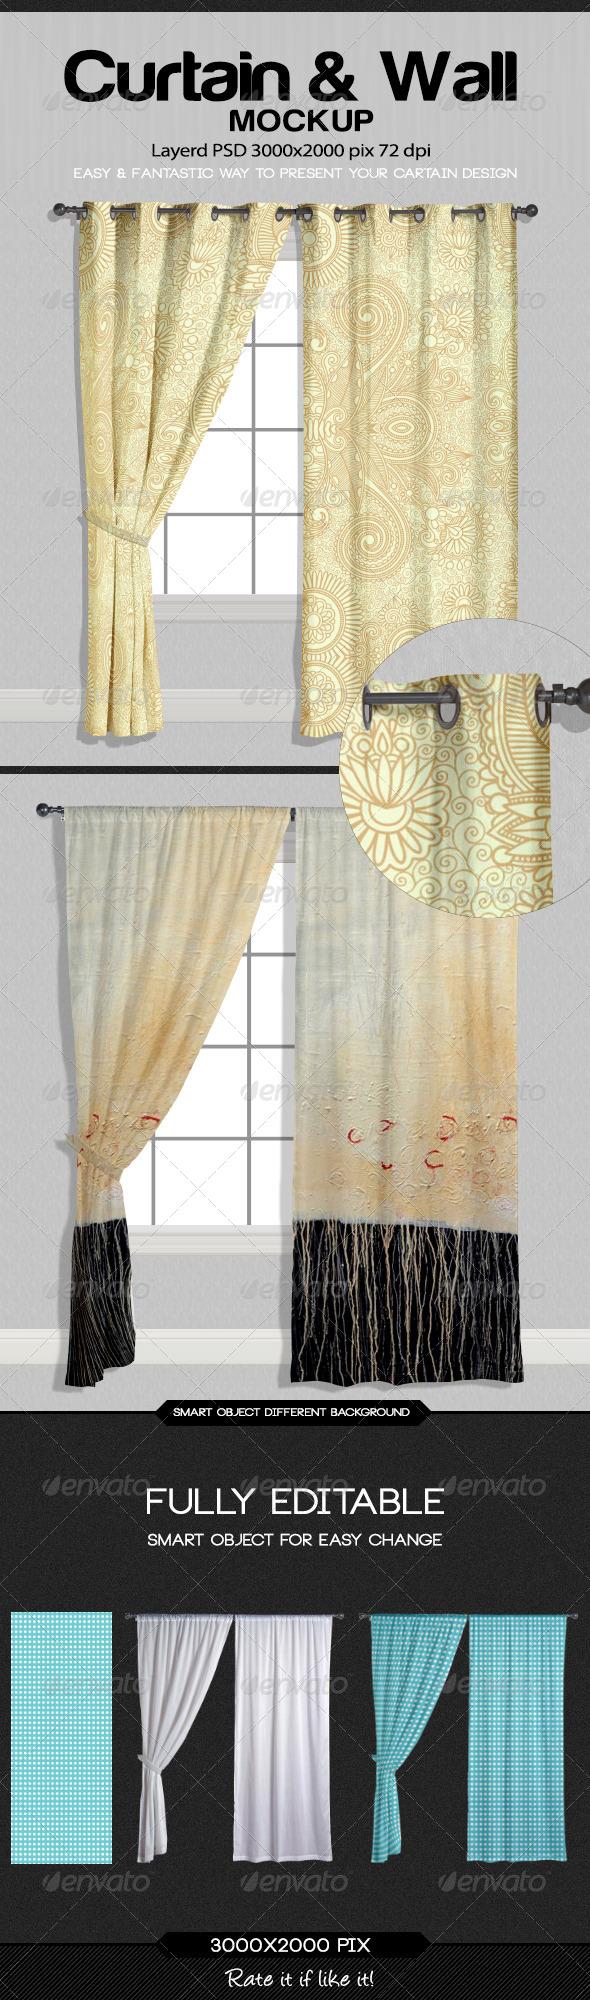 GraphicRiver Curtain & Wall Mockup 8500420